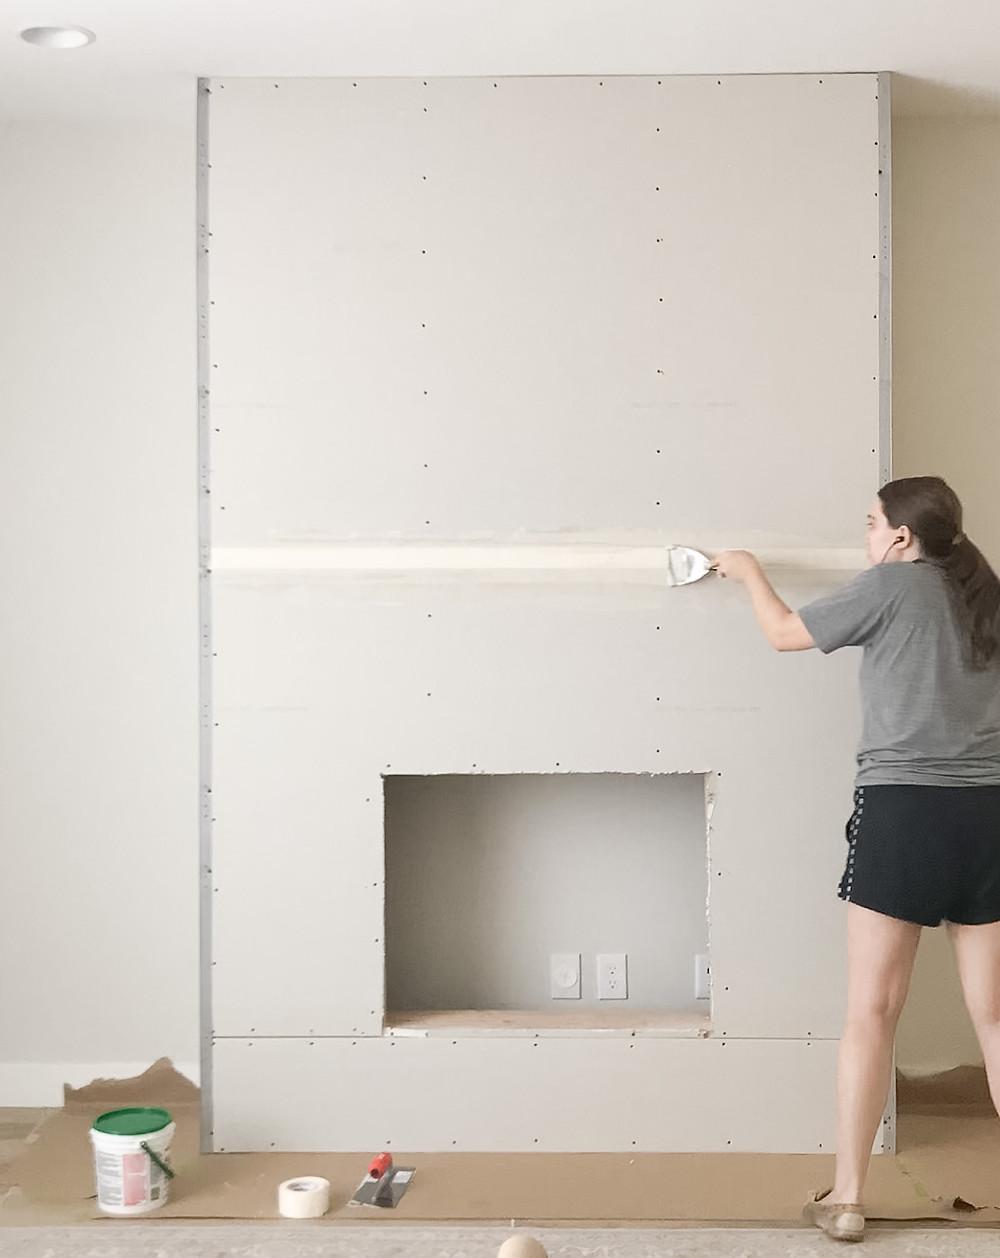 applying tape and mud to drywall seams